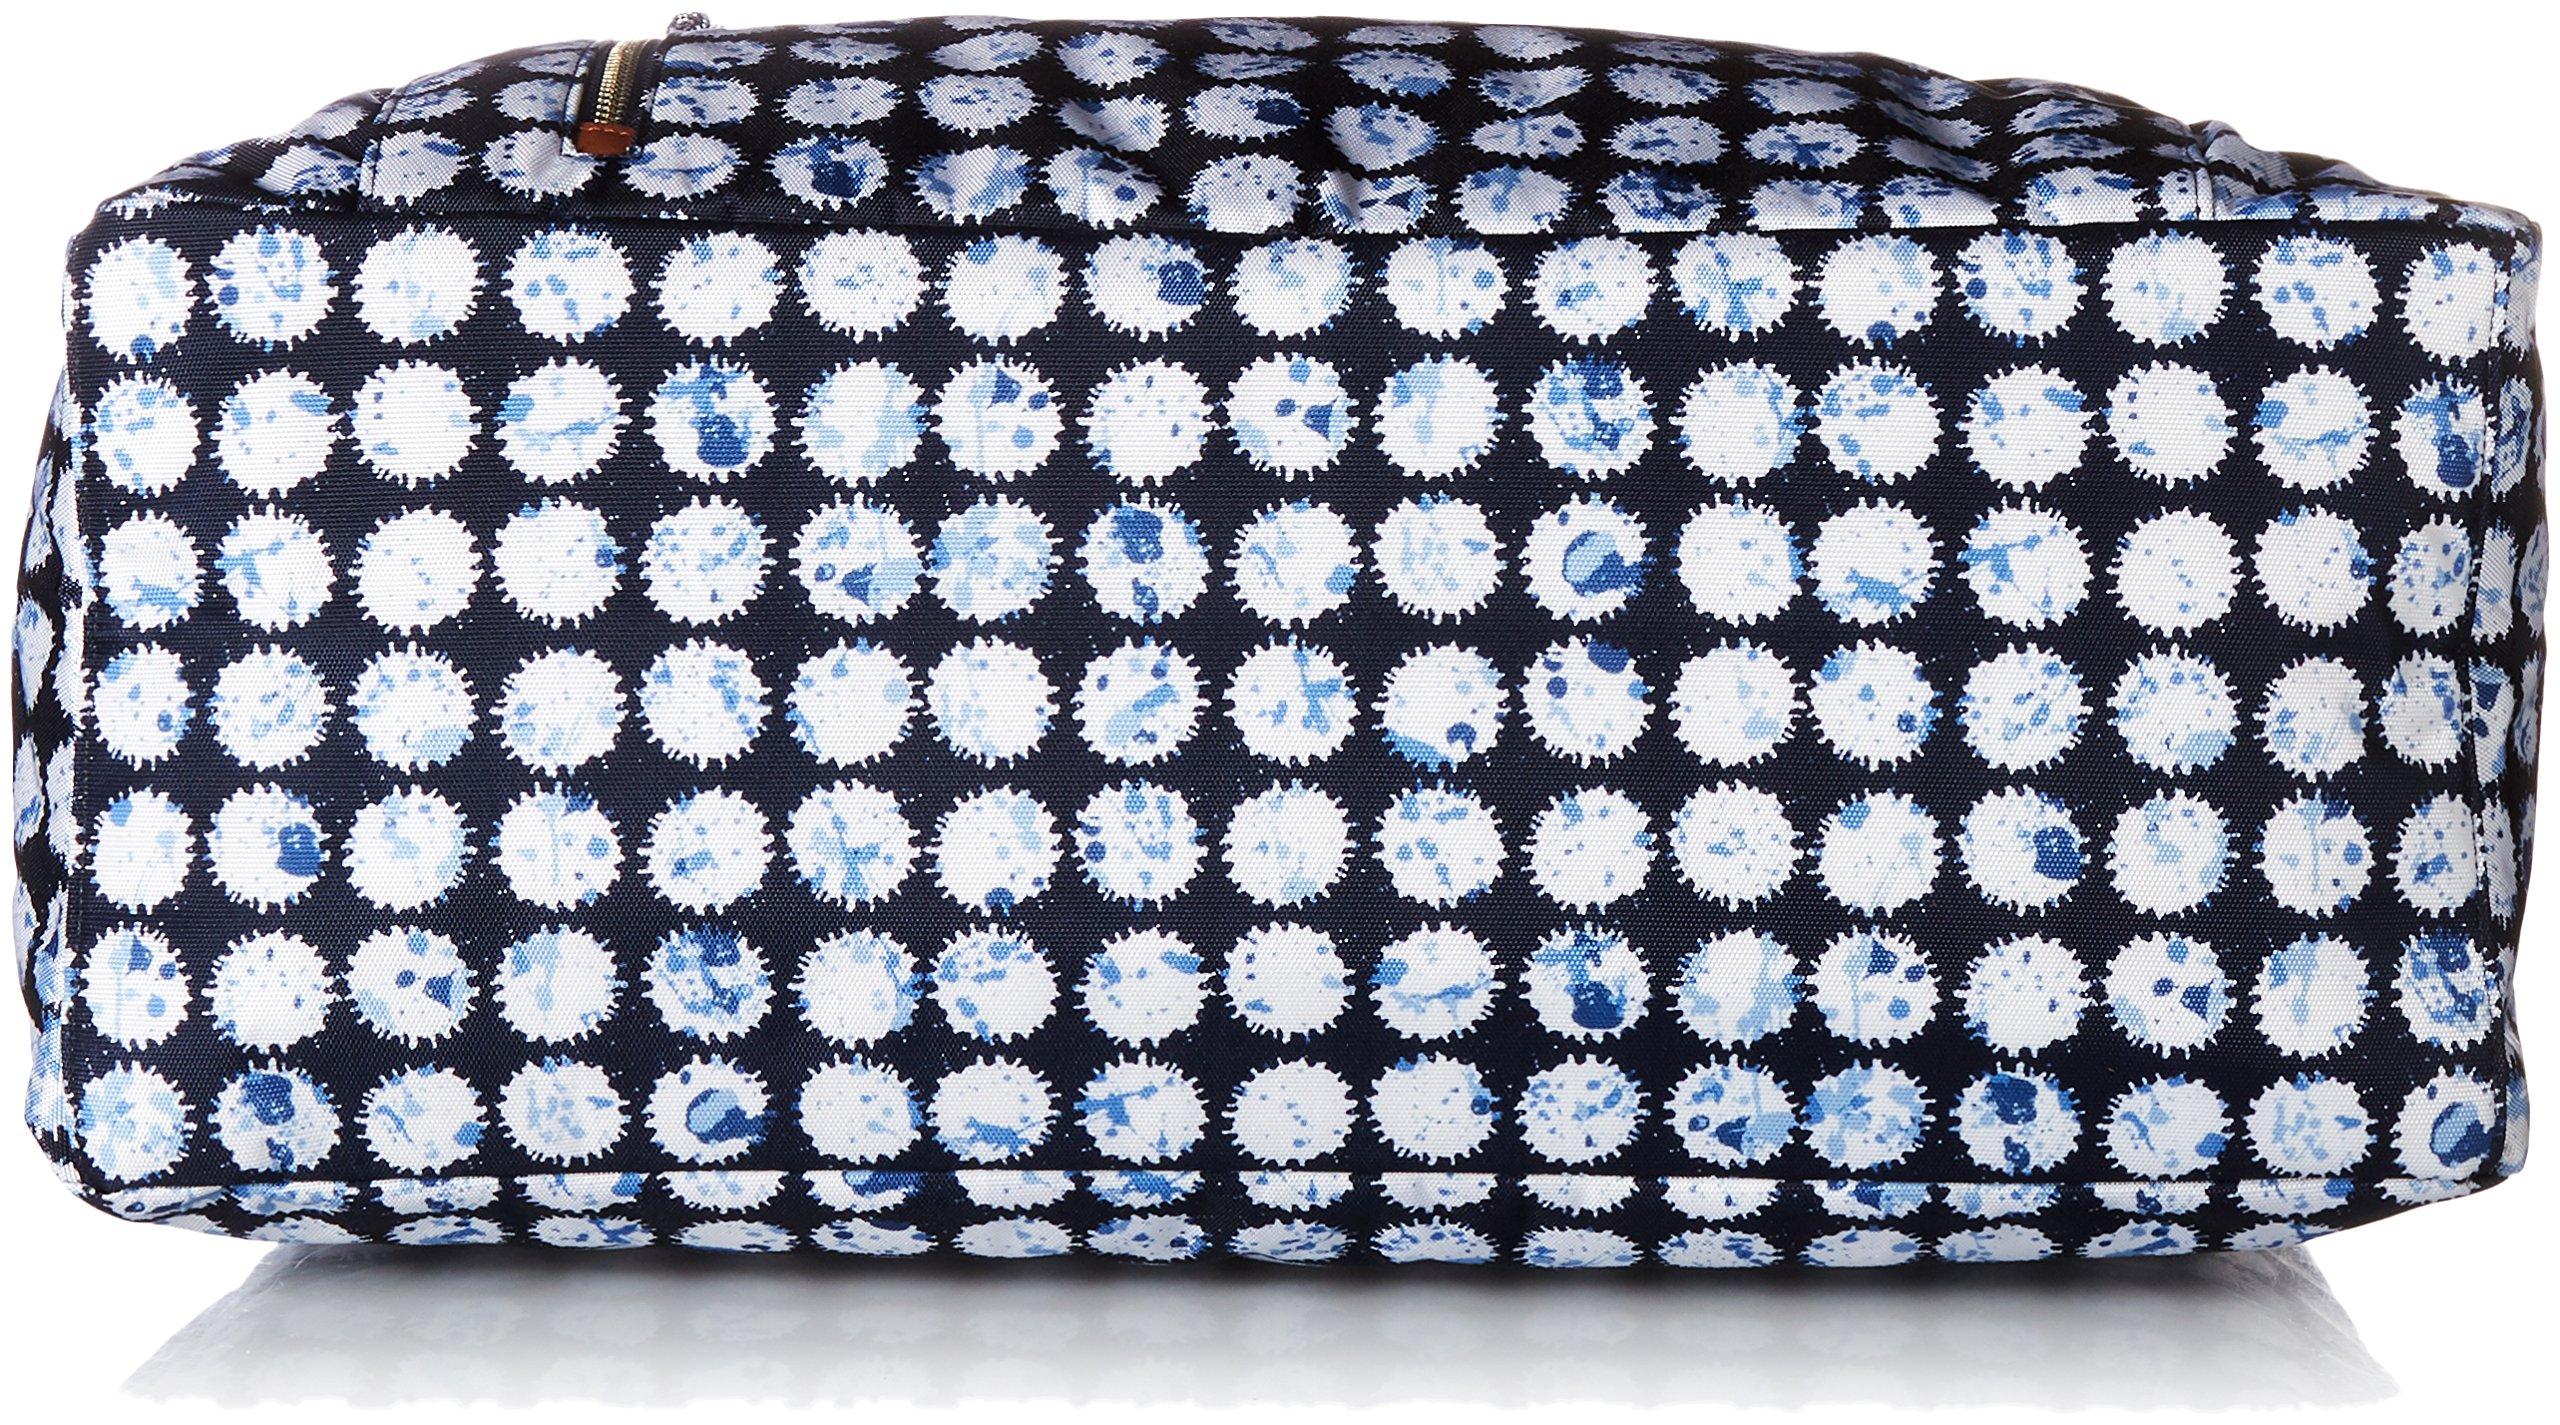 Vera Bradley Lighten up Weekender Travel Bag, Polyester, Splash Dot by Vera Bradley (Image #4)